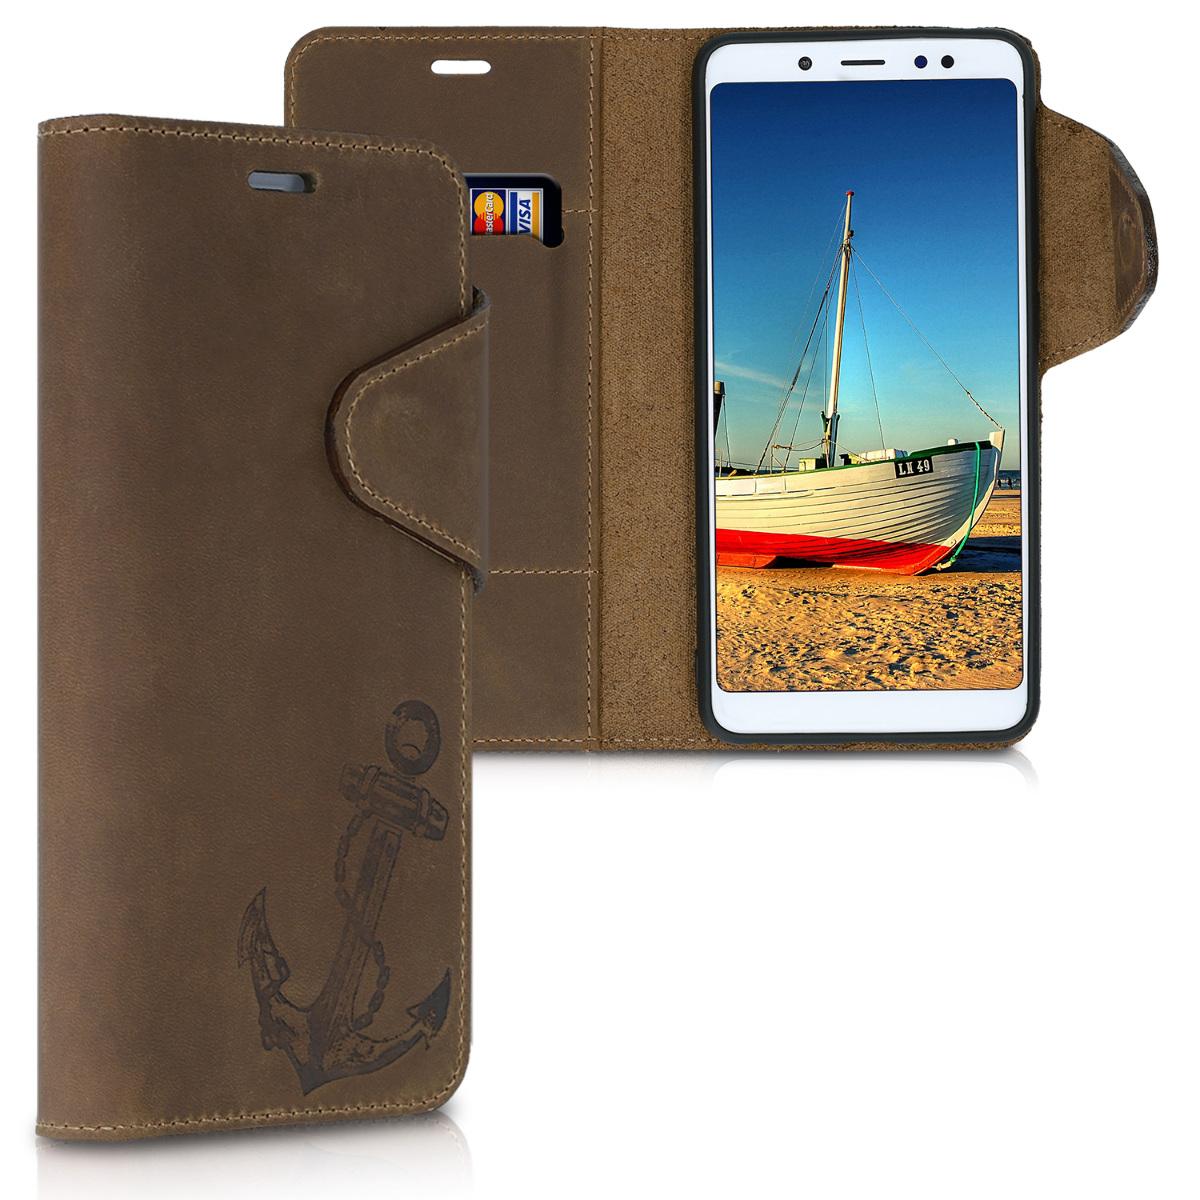 Kalibri Δερμάτινη Suede Θήκη - Πορτοφόλι Xiaomi Redmi Note 5 (Global Version) / Note 5 Pro - Brown (47462.01)